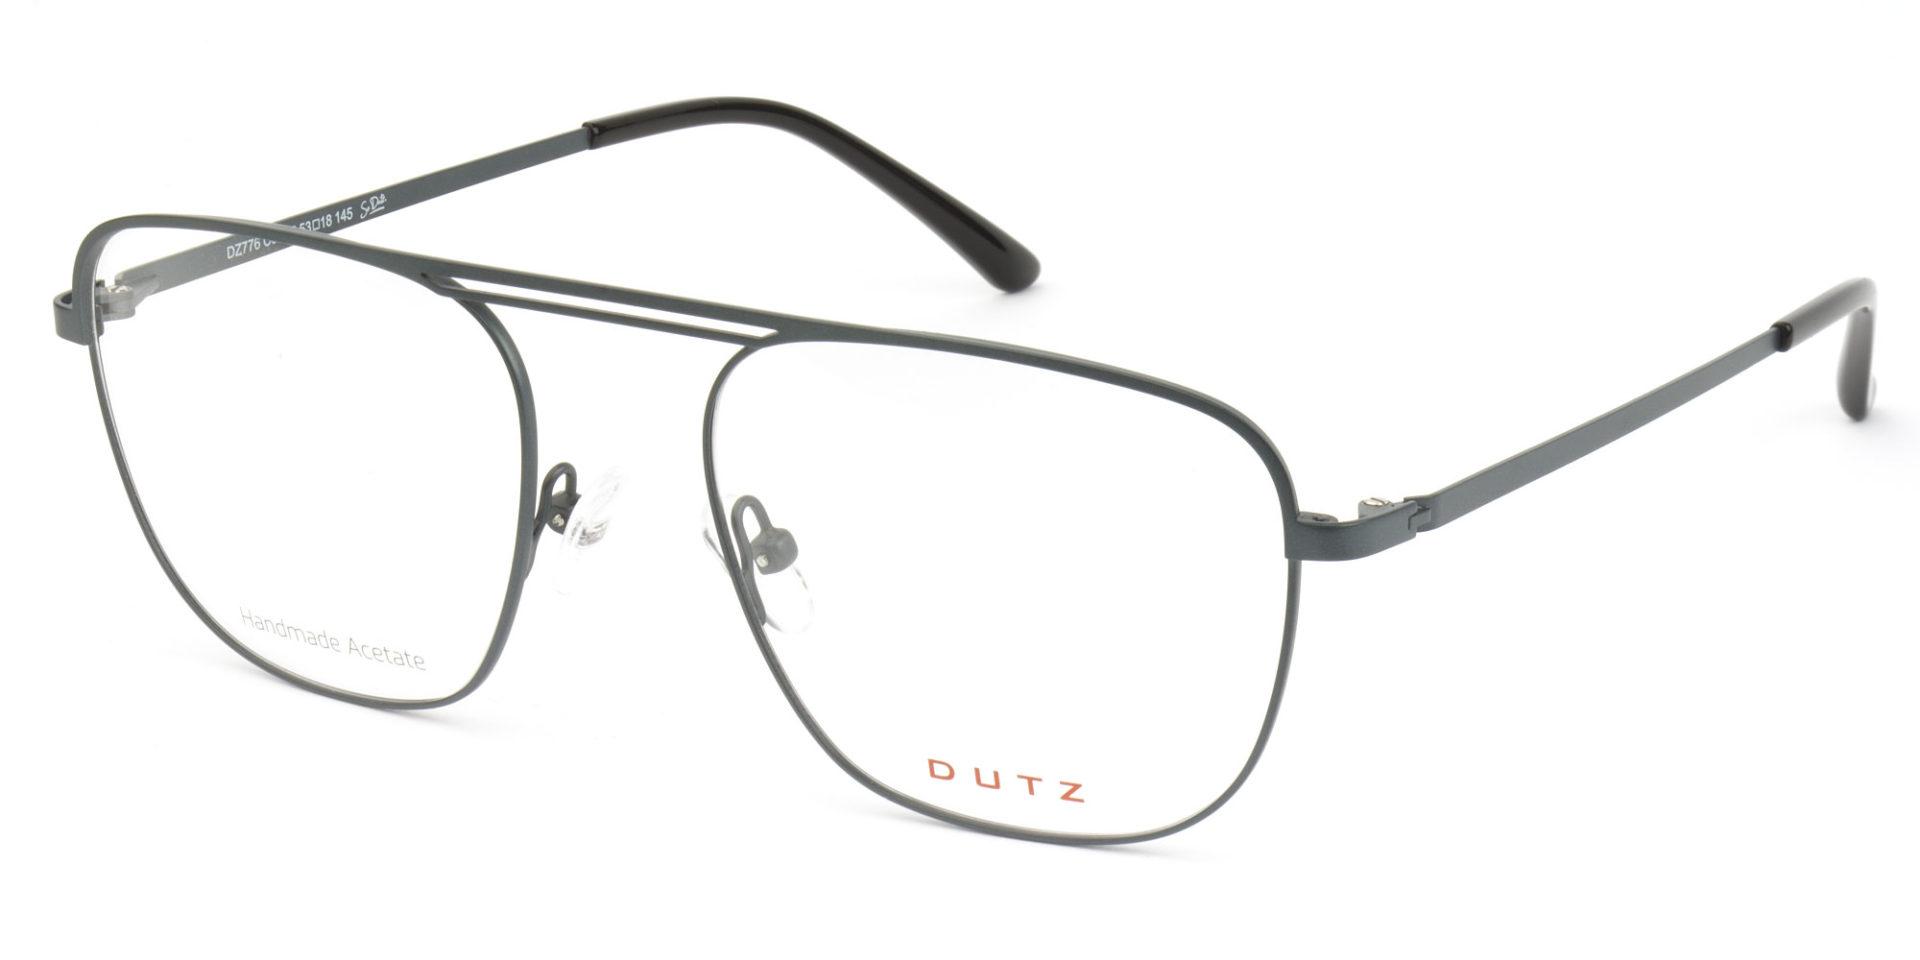 DZ776-85